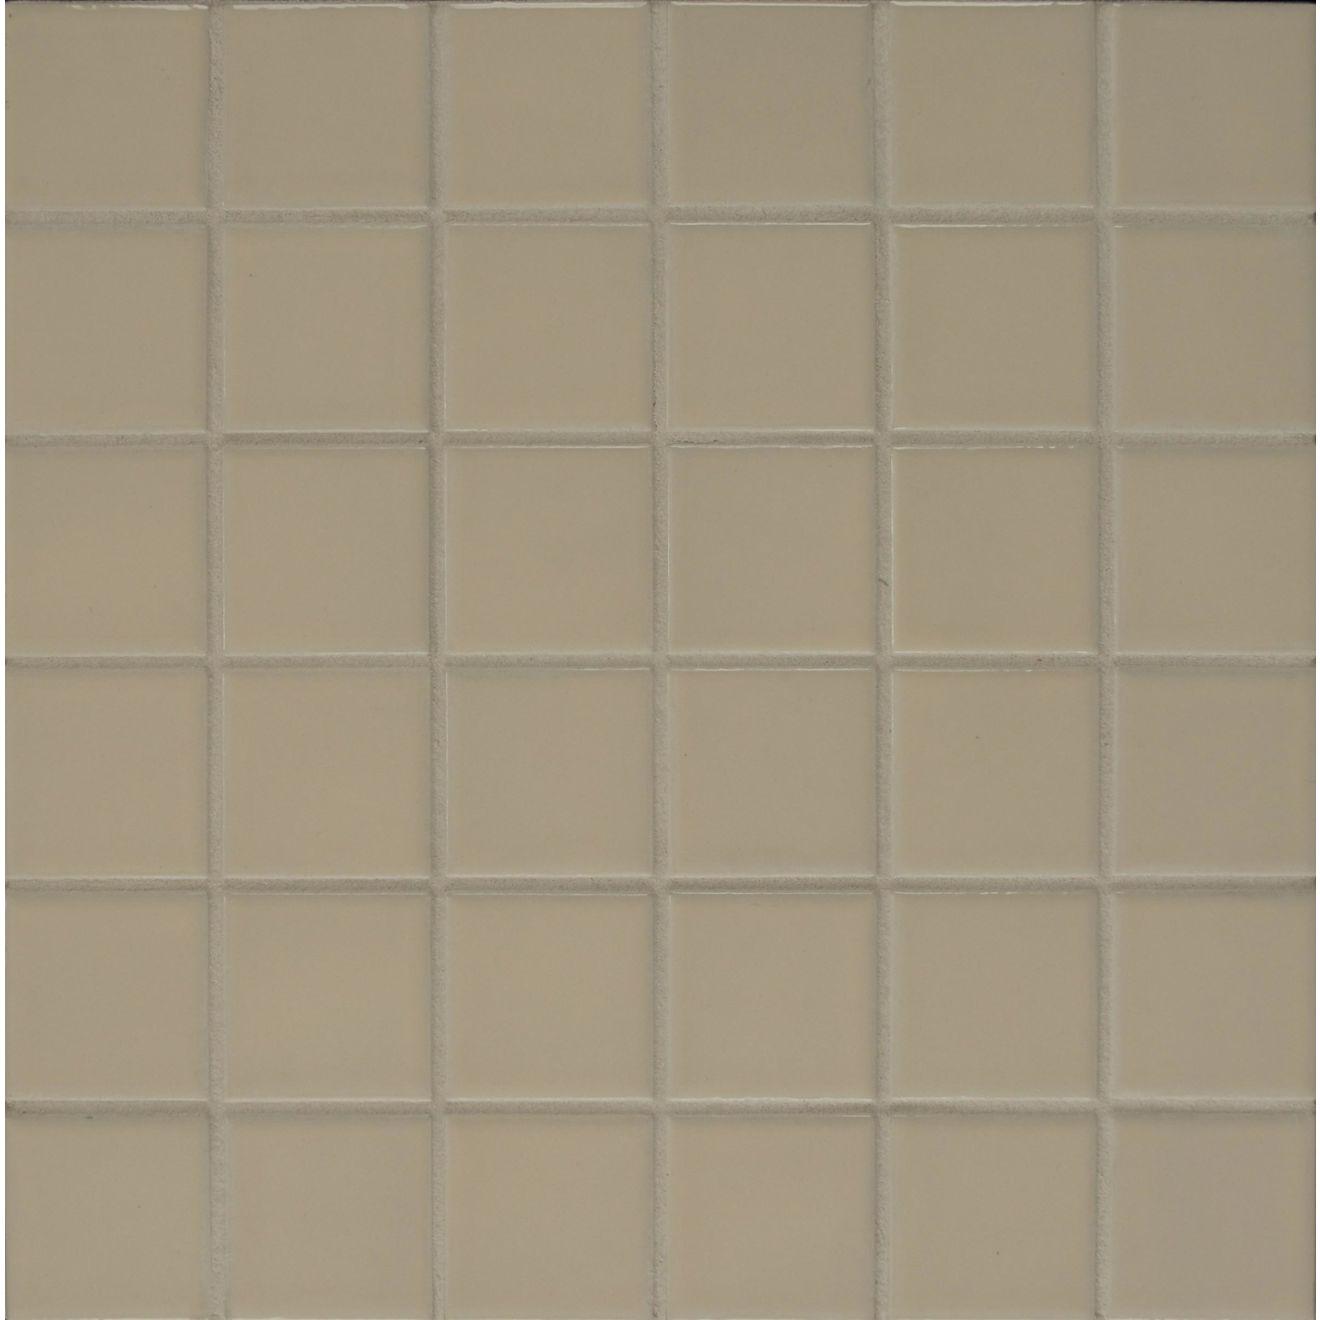 Elements Floor & Wall Mosaic in Dark Biscuit